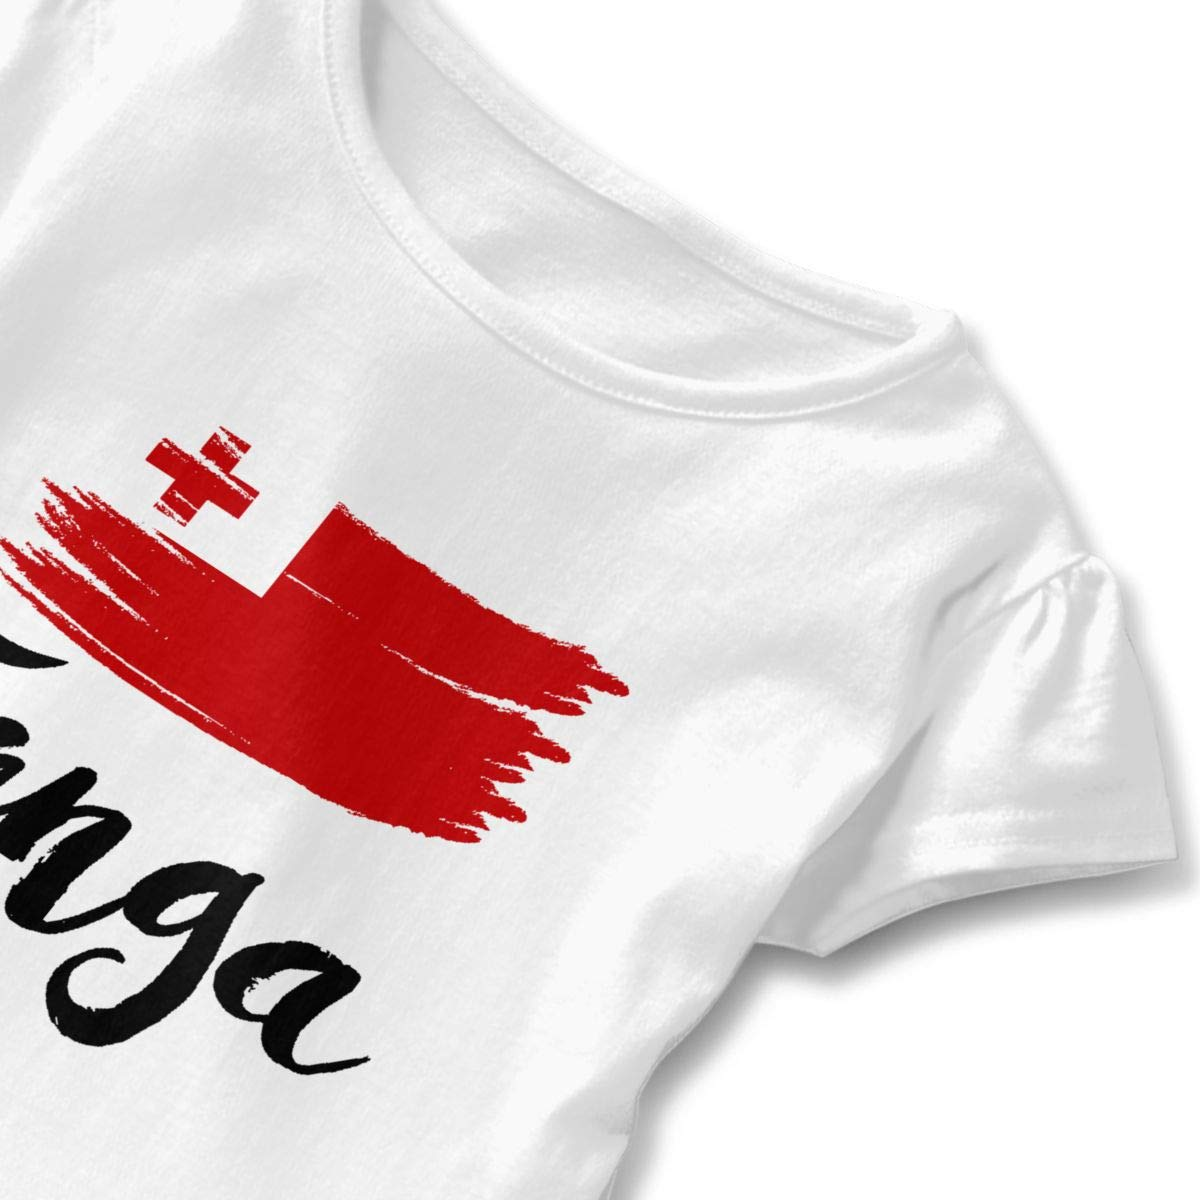 JVNSS Tonga Flag T-Shirt Kids Flounced T Shirts Fashion Graphic T-Shirt for 2-6T Kids Girls